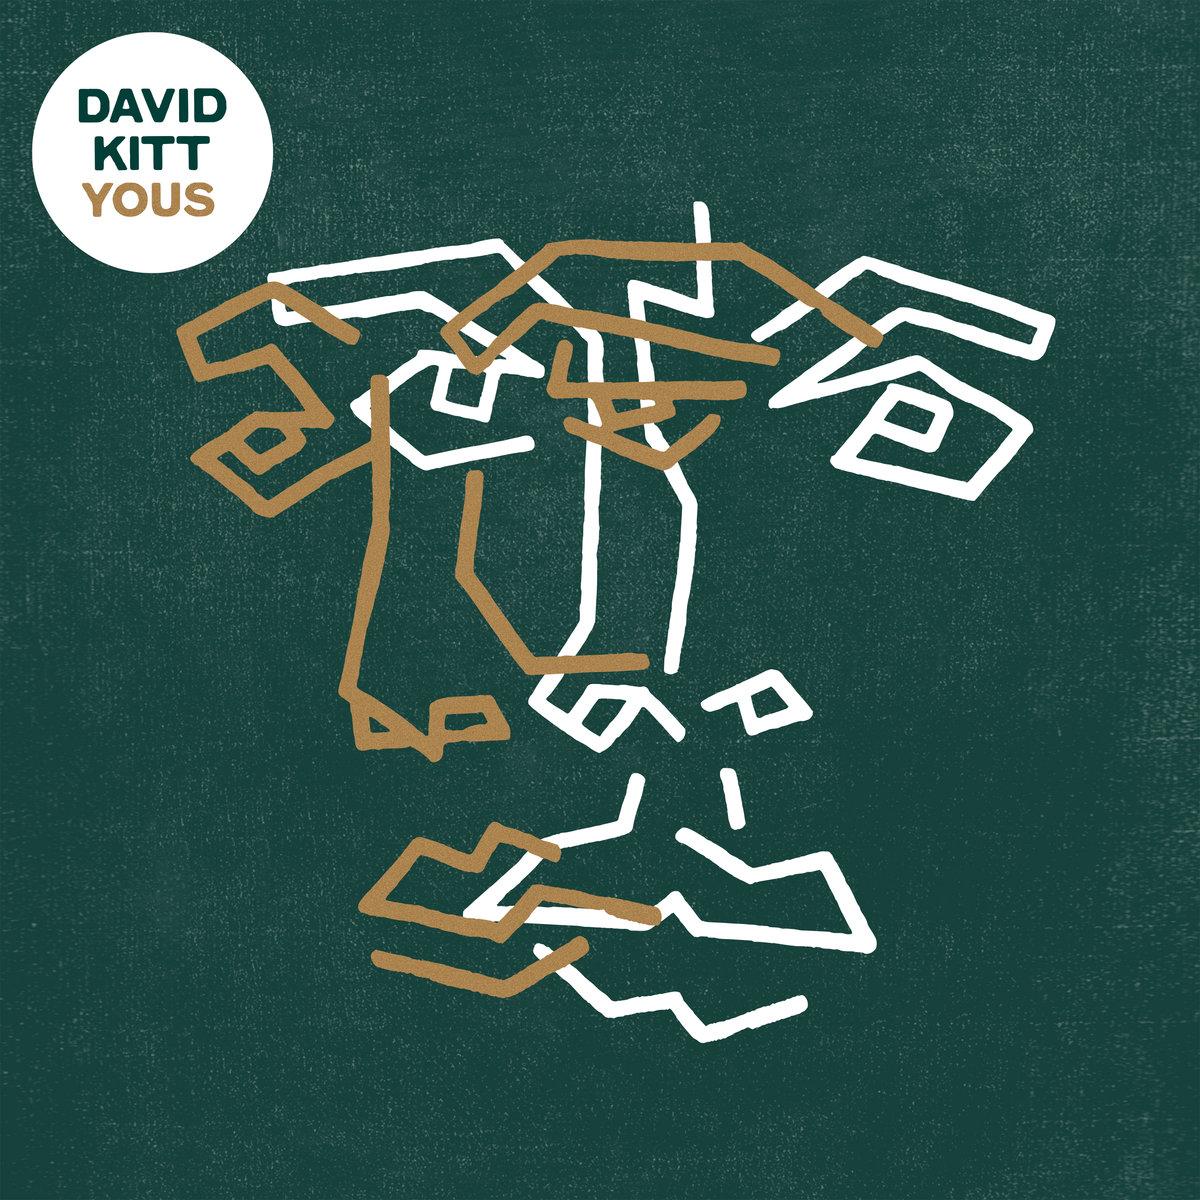 David Kitt - Yous album cover